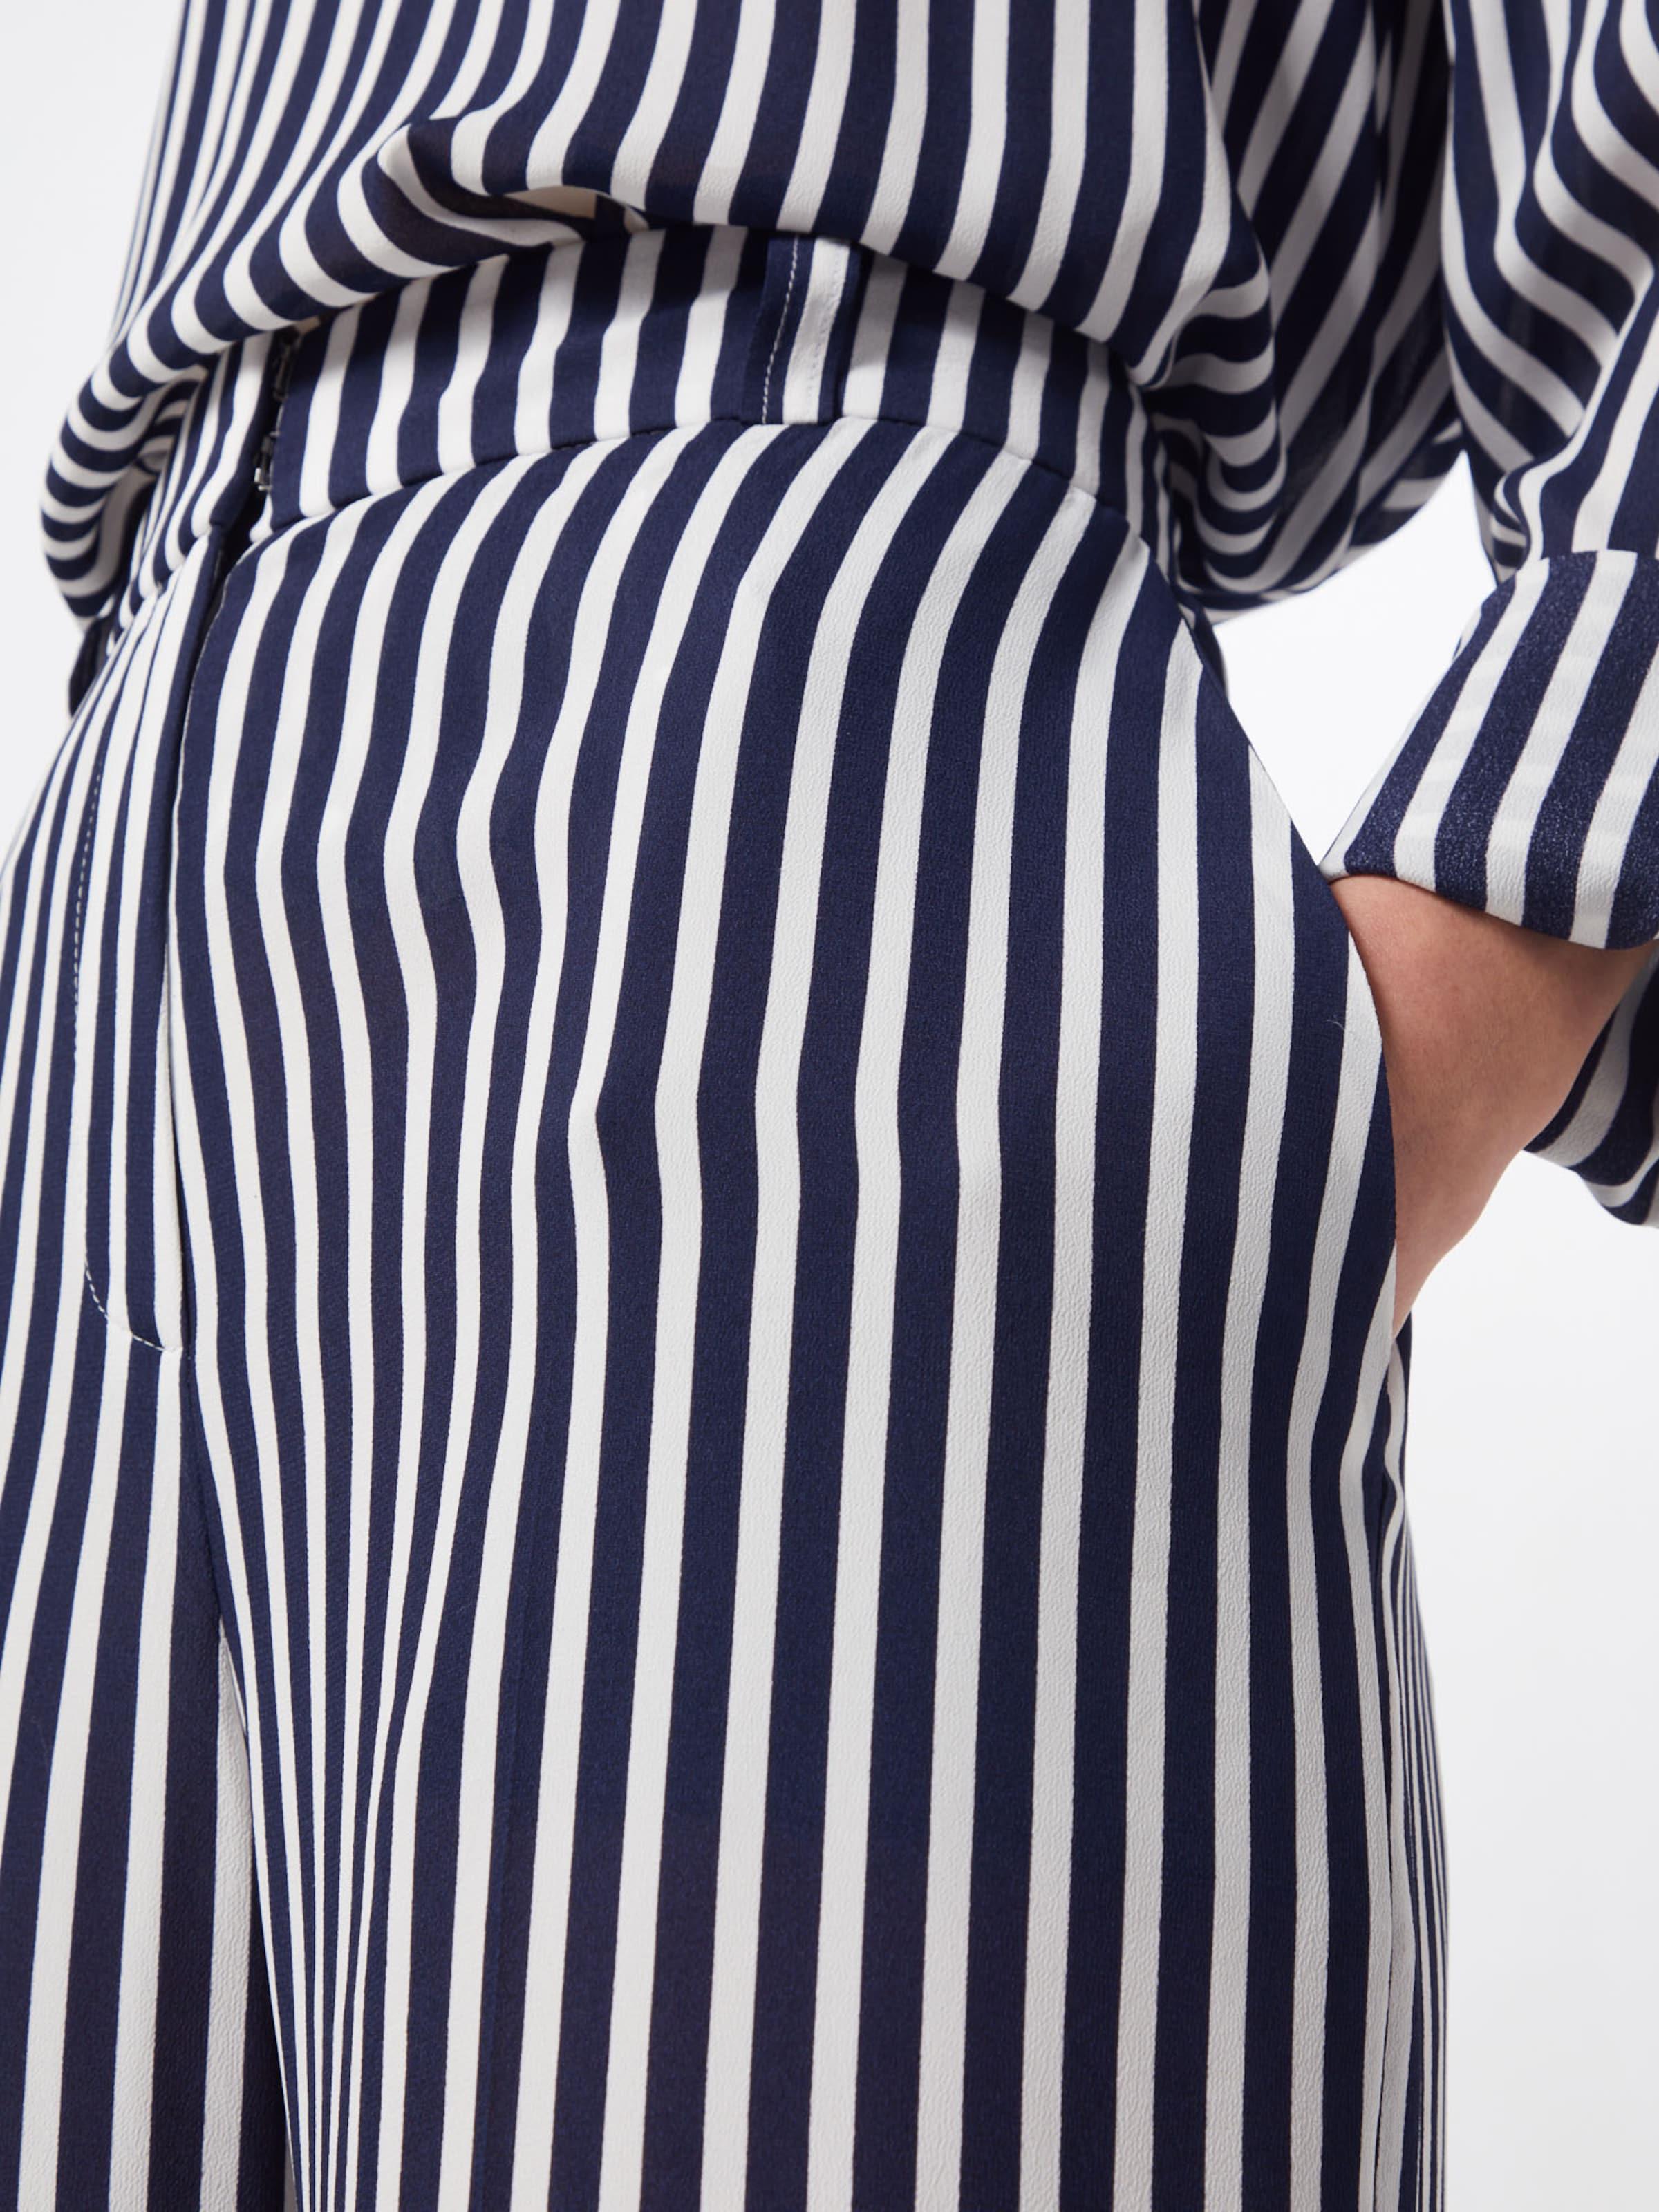 En Hugo 'hatessi' Pantalon MarineBlanc Bleu NP8kwOnX0